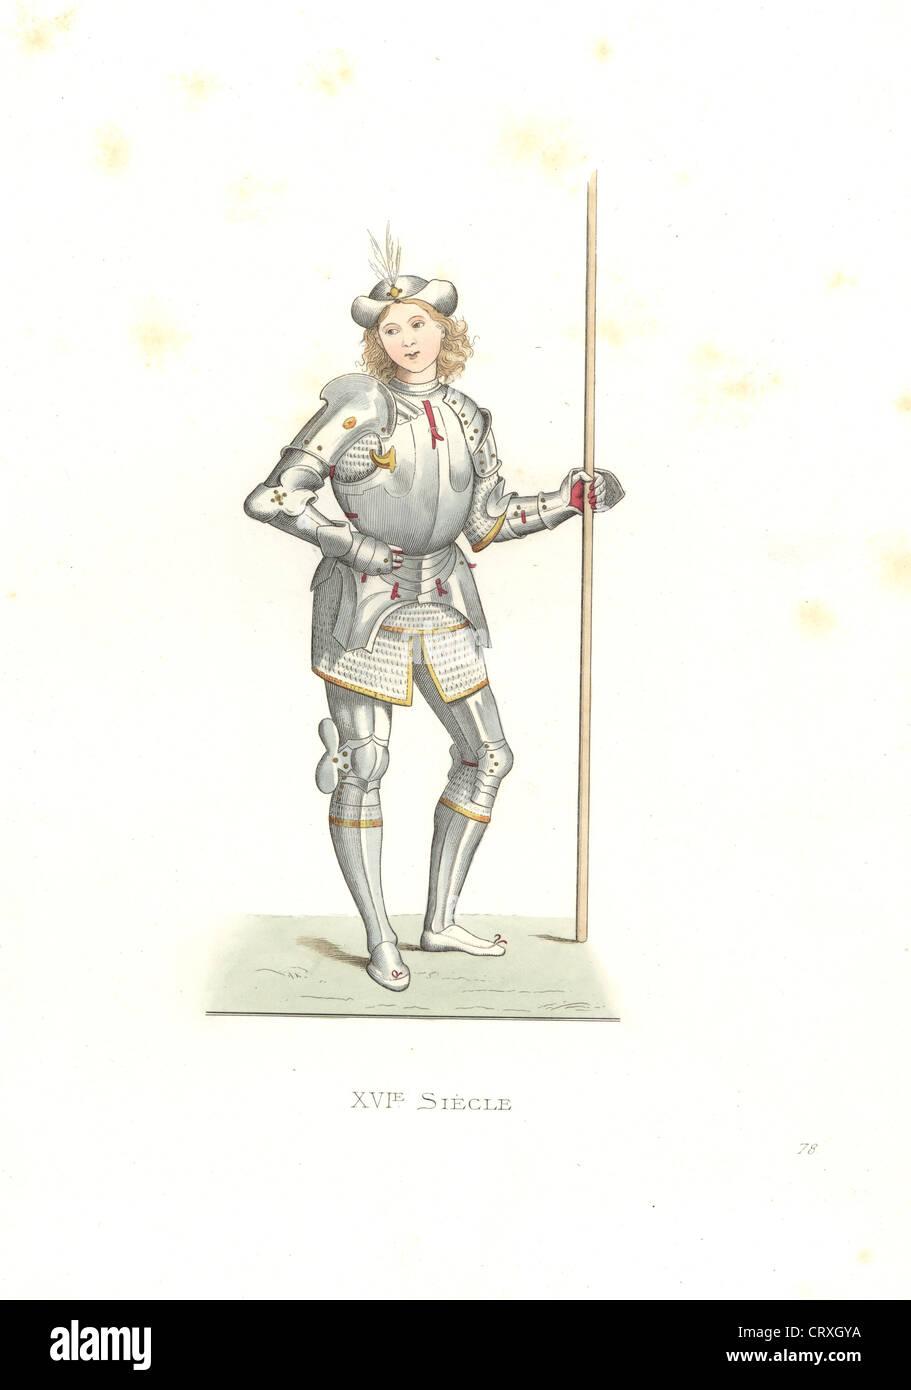 Italian man of arms, 16th century, after an illustration by Italian artist Bernardino di Benedetto, il Pinturicchio. Stock Photo